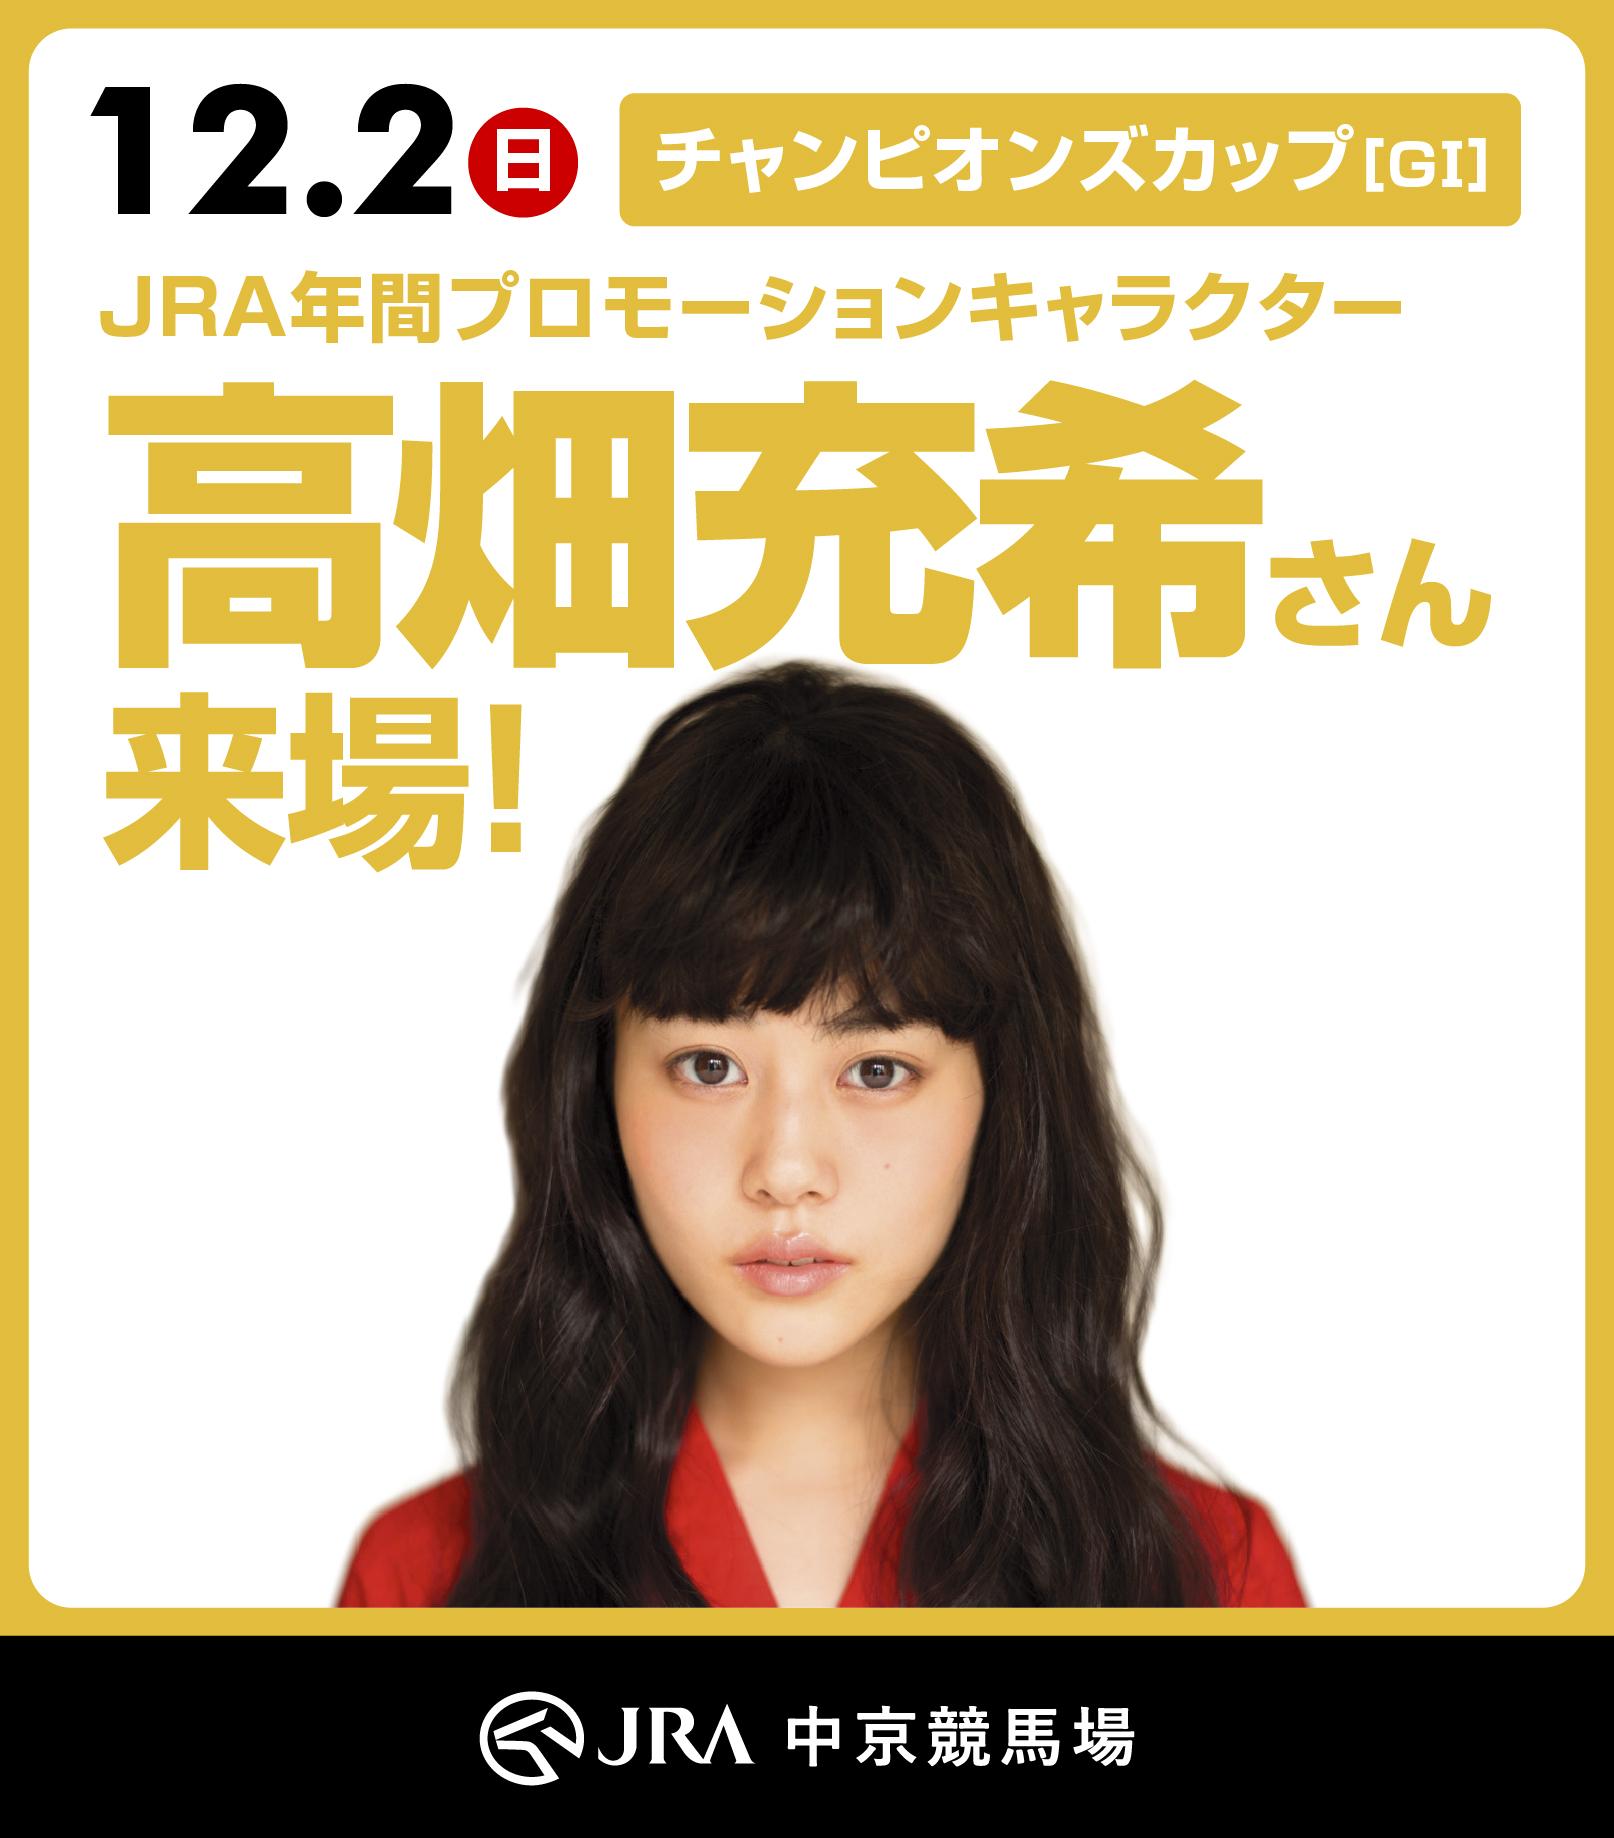 _vision_3_高畑.jpg